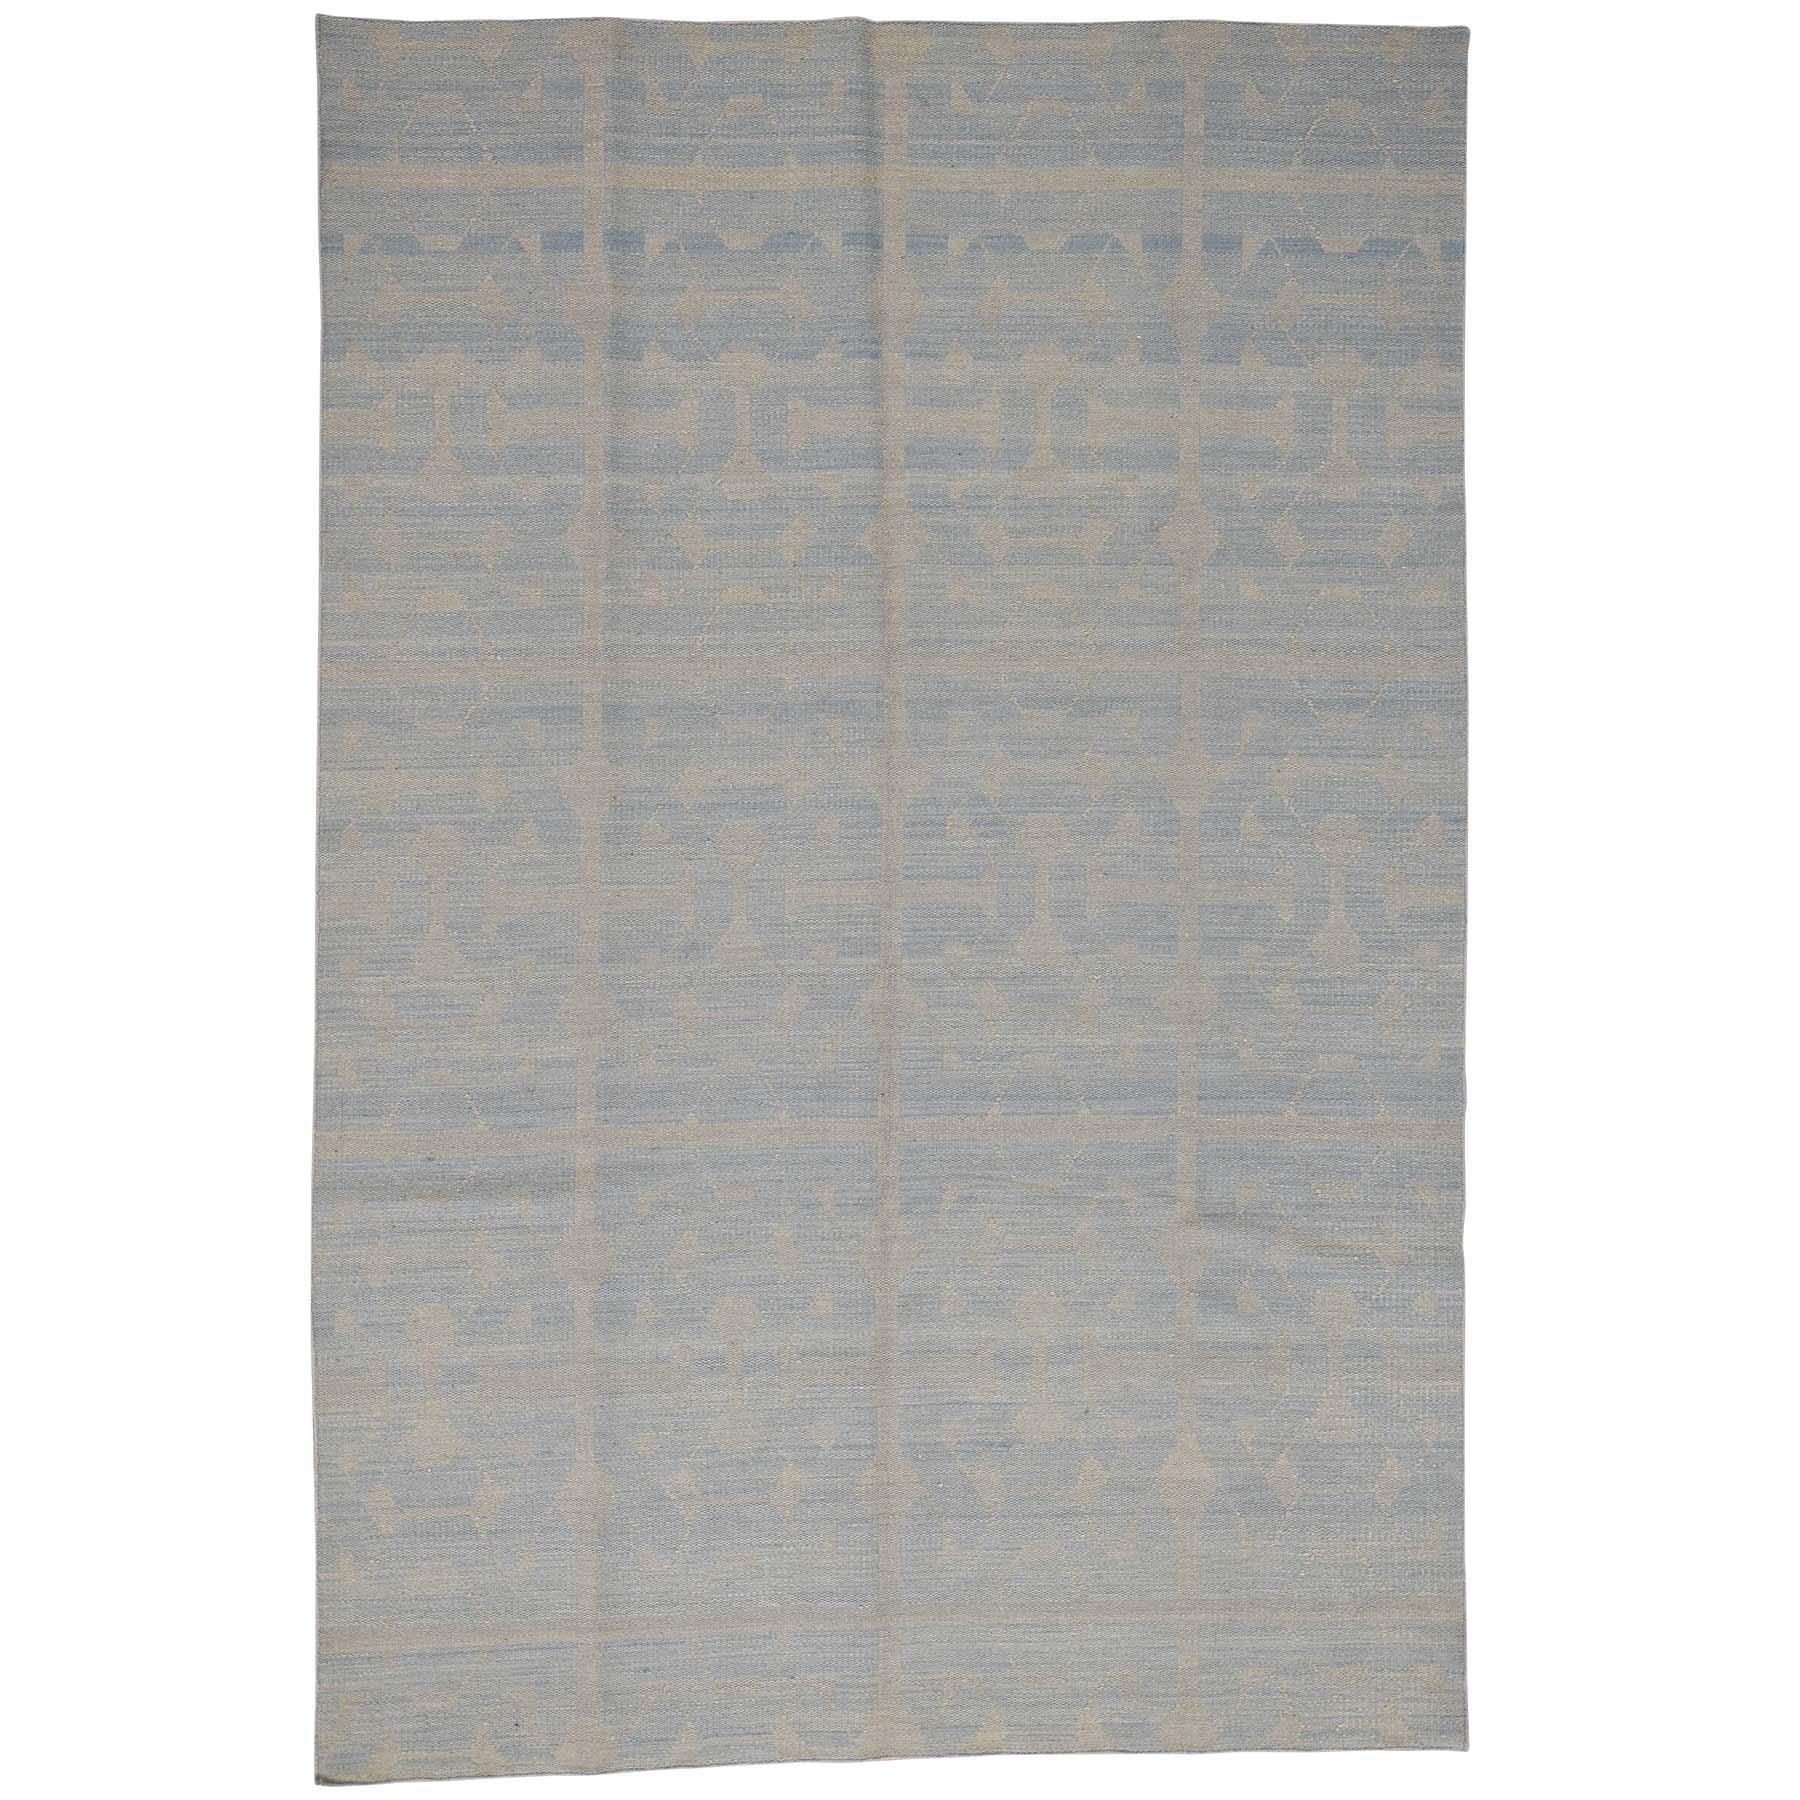 5'X6'10'' Hand-Woven Pure Wool Sky Blue Reversible Kilim Flat Weave Rug moac7999